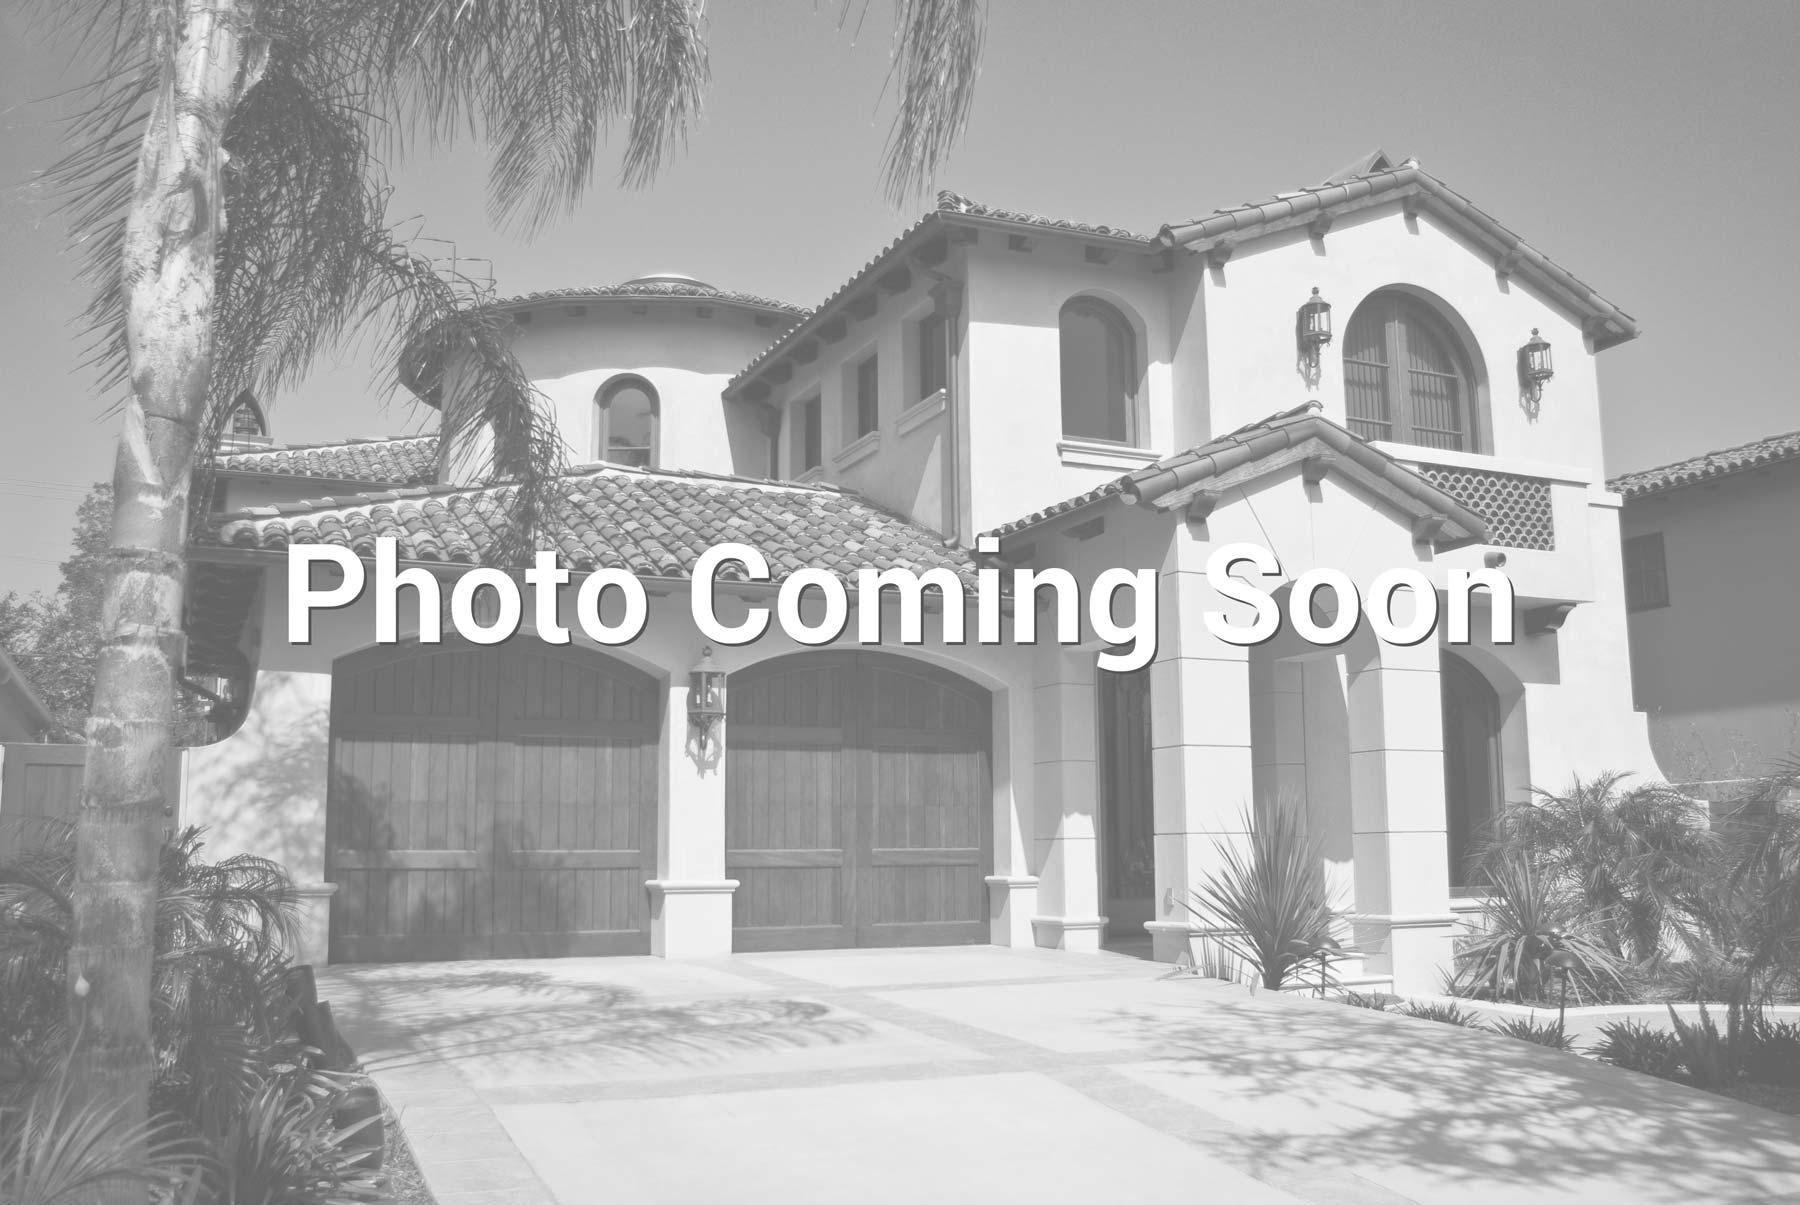 $1,075,000 - 4Br/3Ba - Home for Sale in Desert Ridge Lot 29, Phoenix